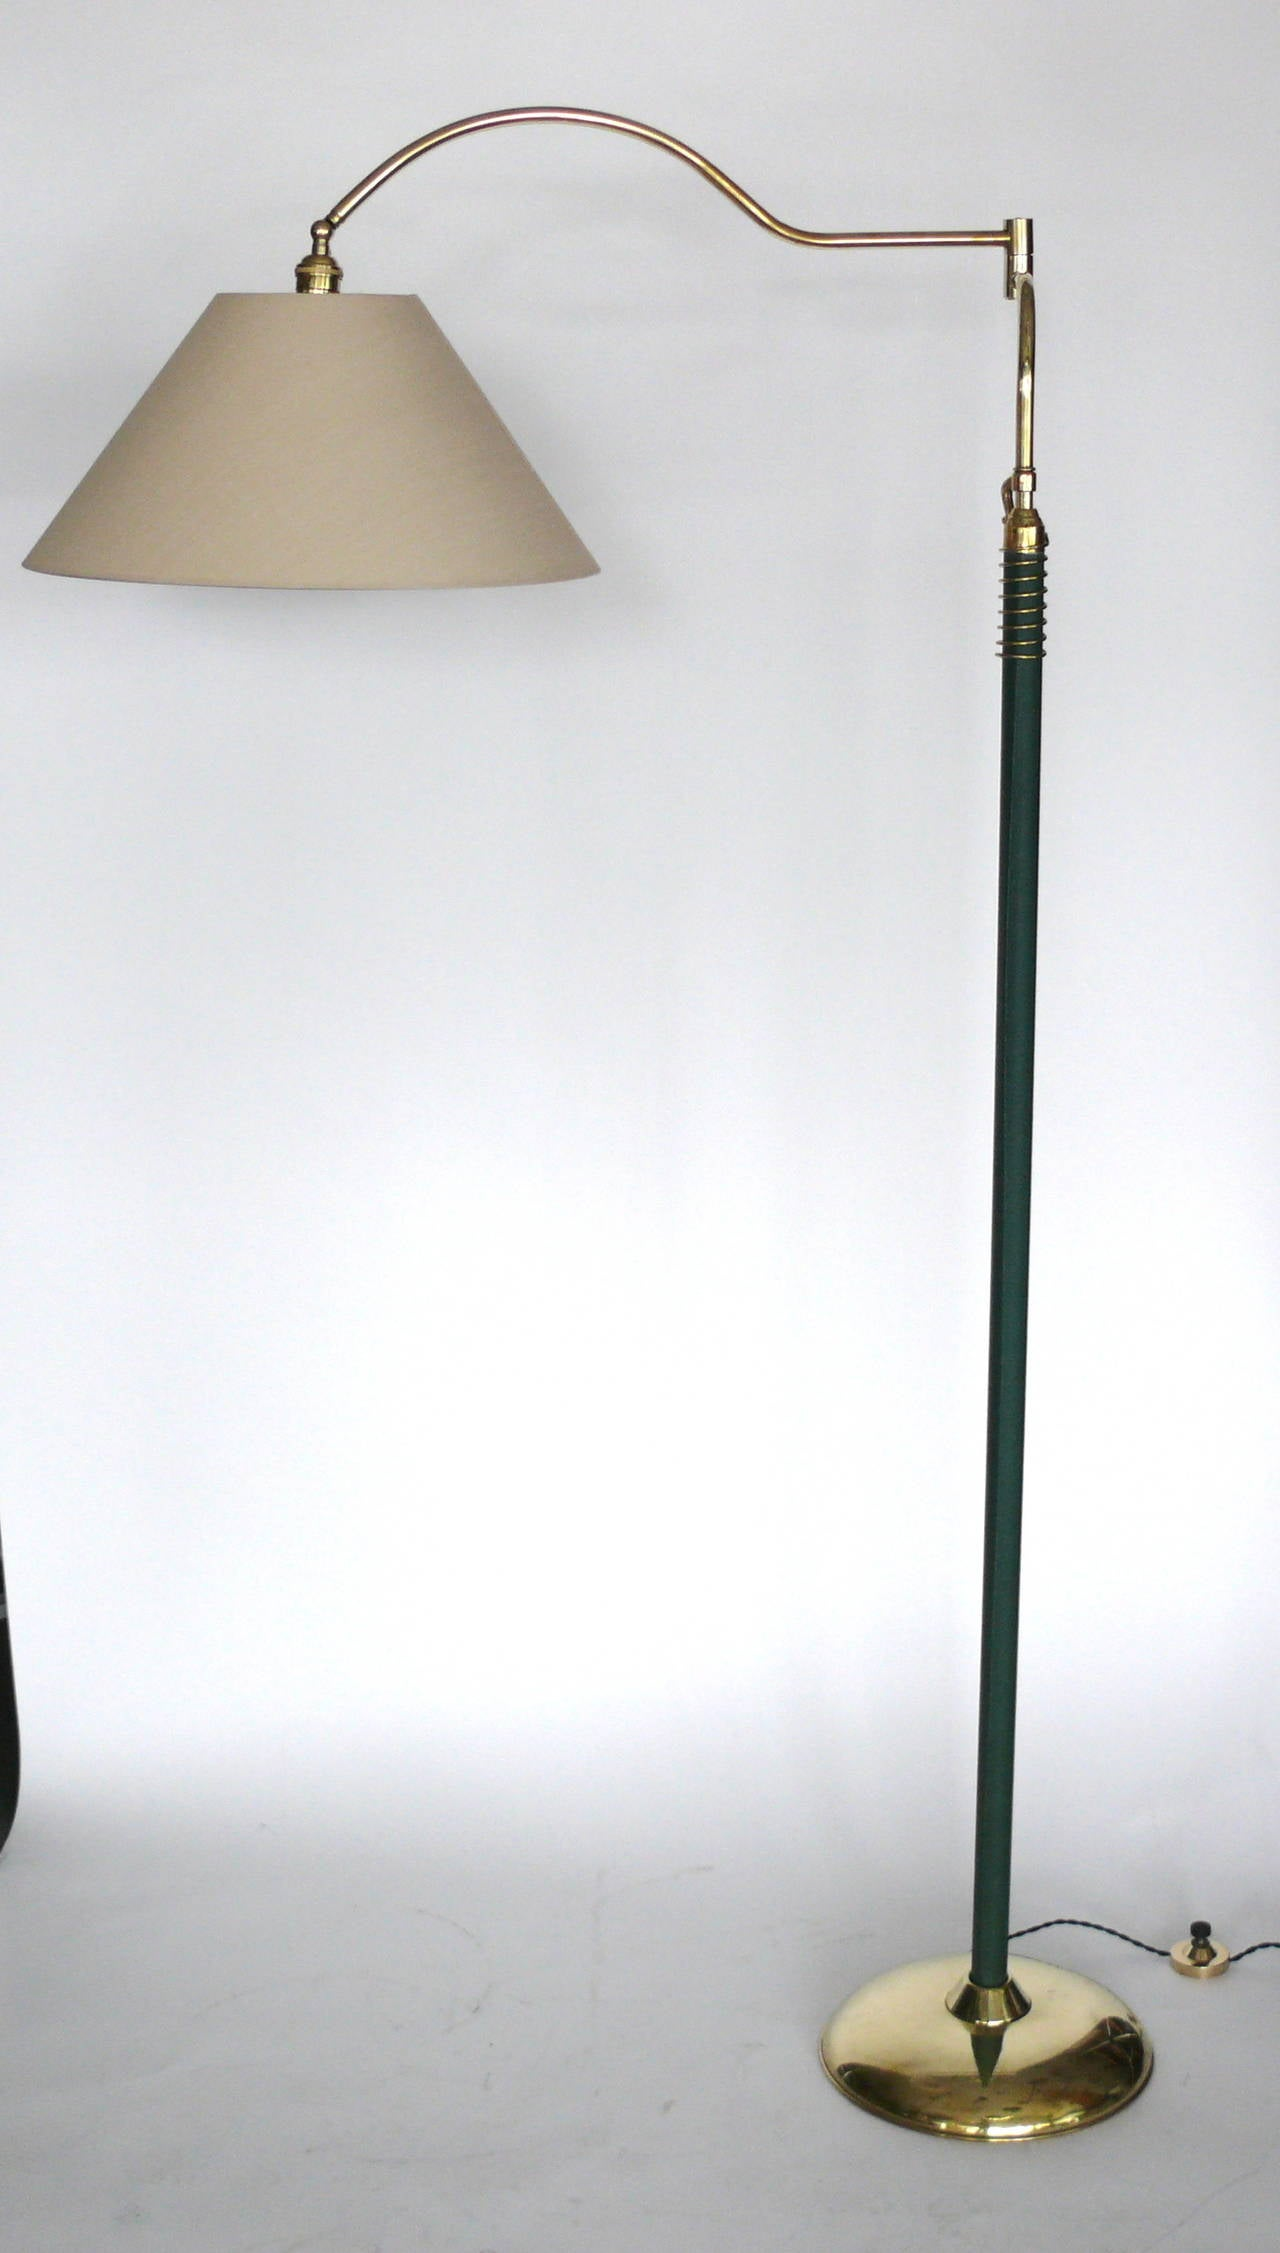 Articulating floor lamp by arredoluce for sale at 1stdibs for Arredo luce